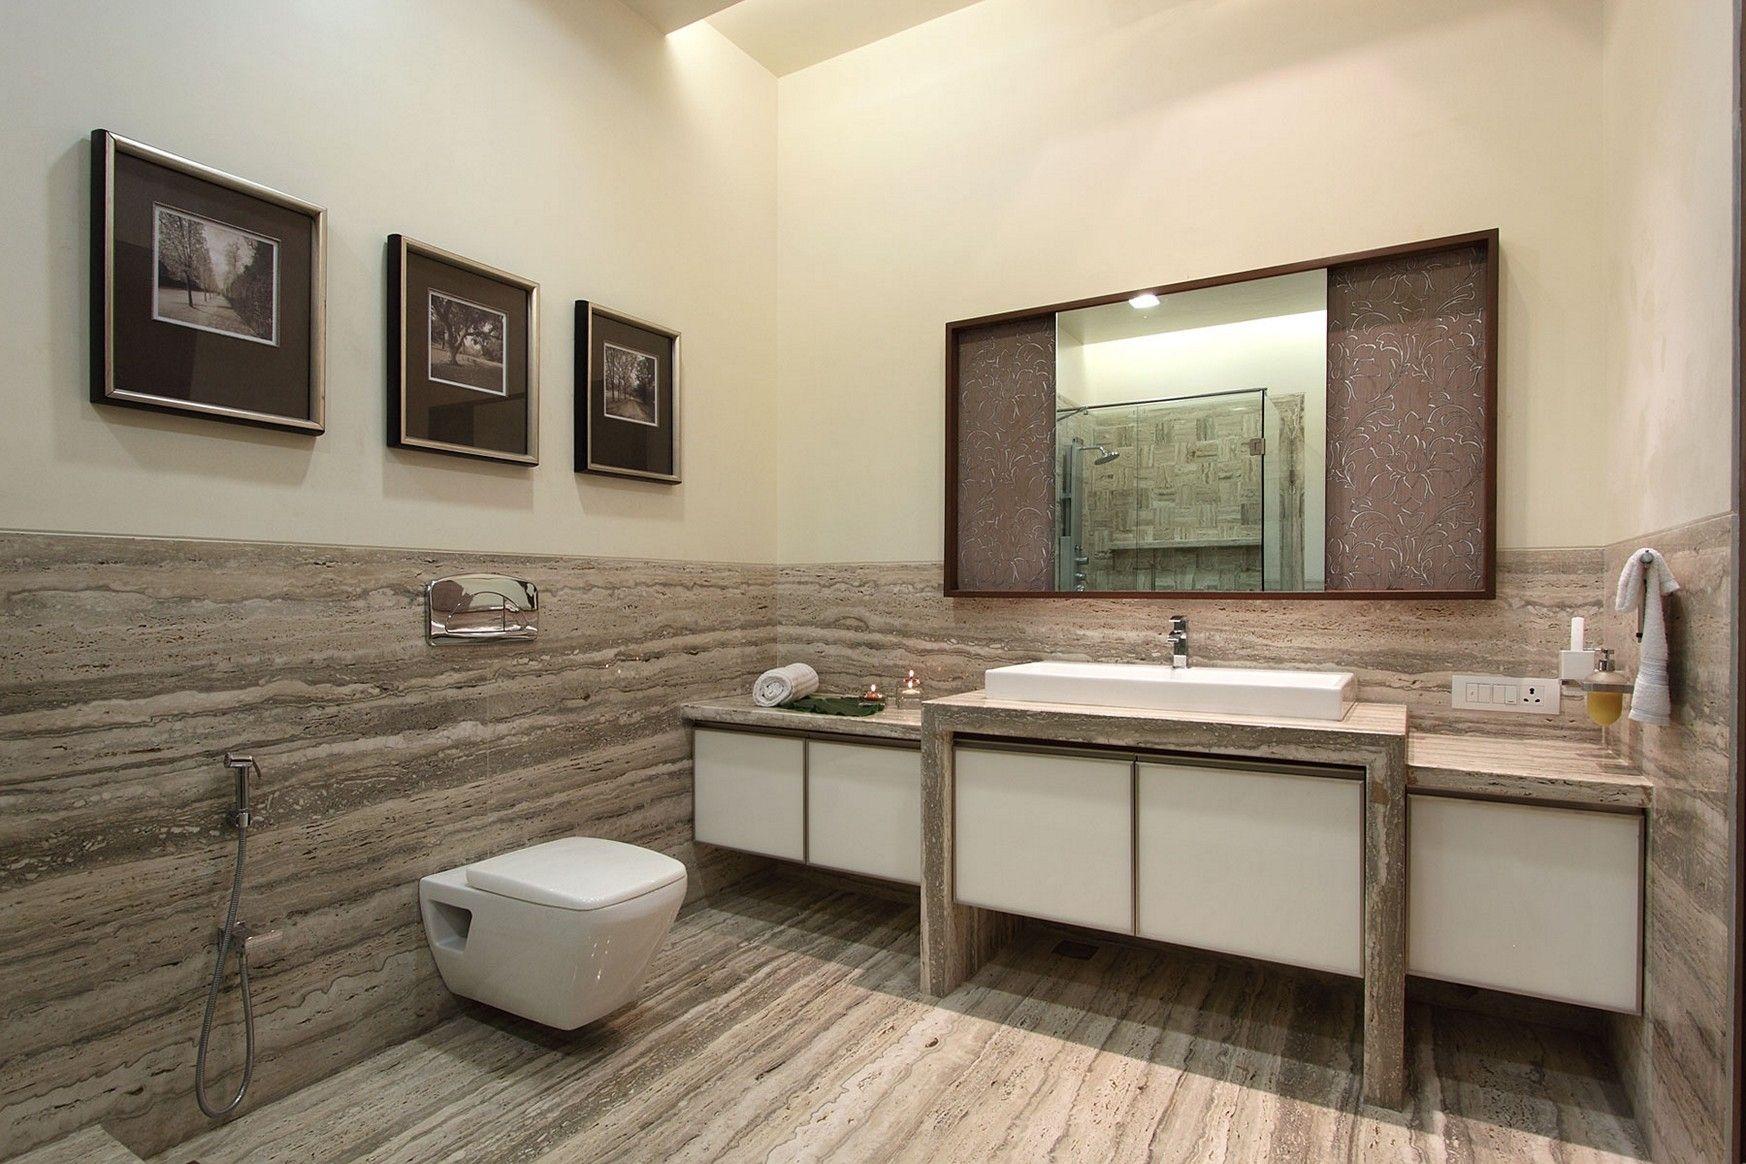 Laminate Flooring On Bathroom Walls Flooring On Walls Laminate Flooring On Walls Small Bathroom Decor